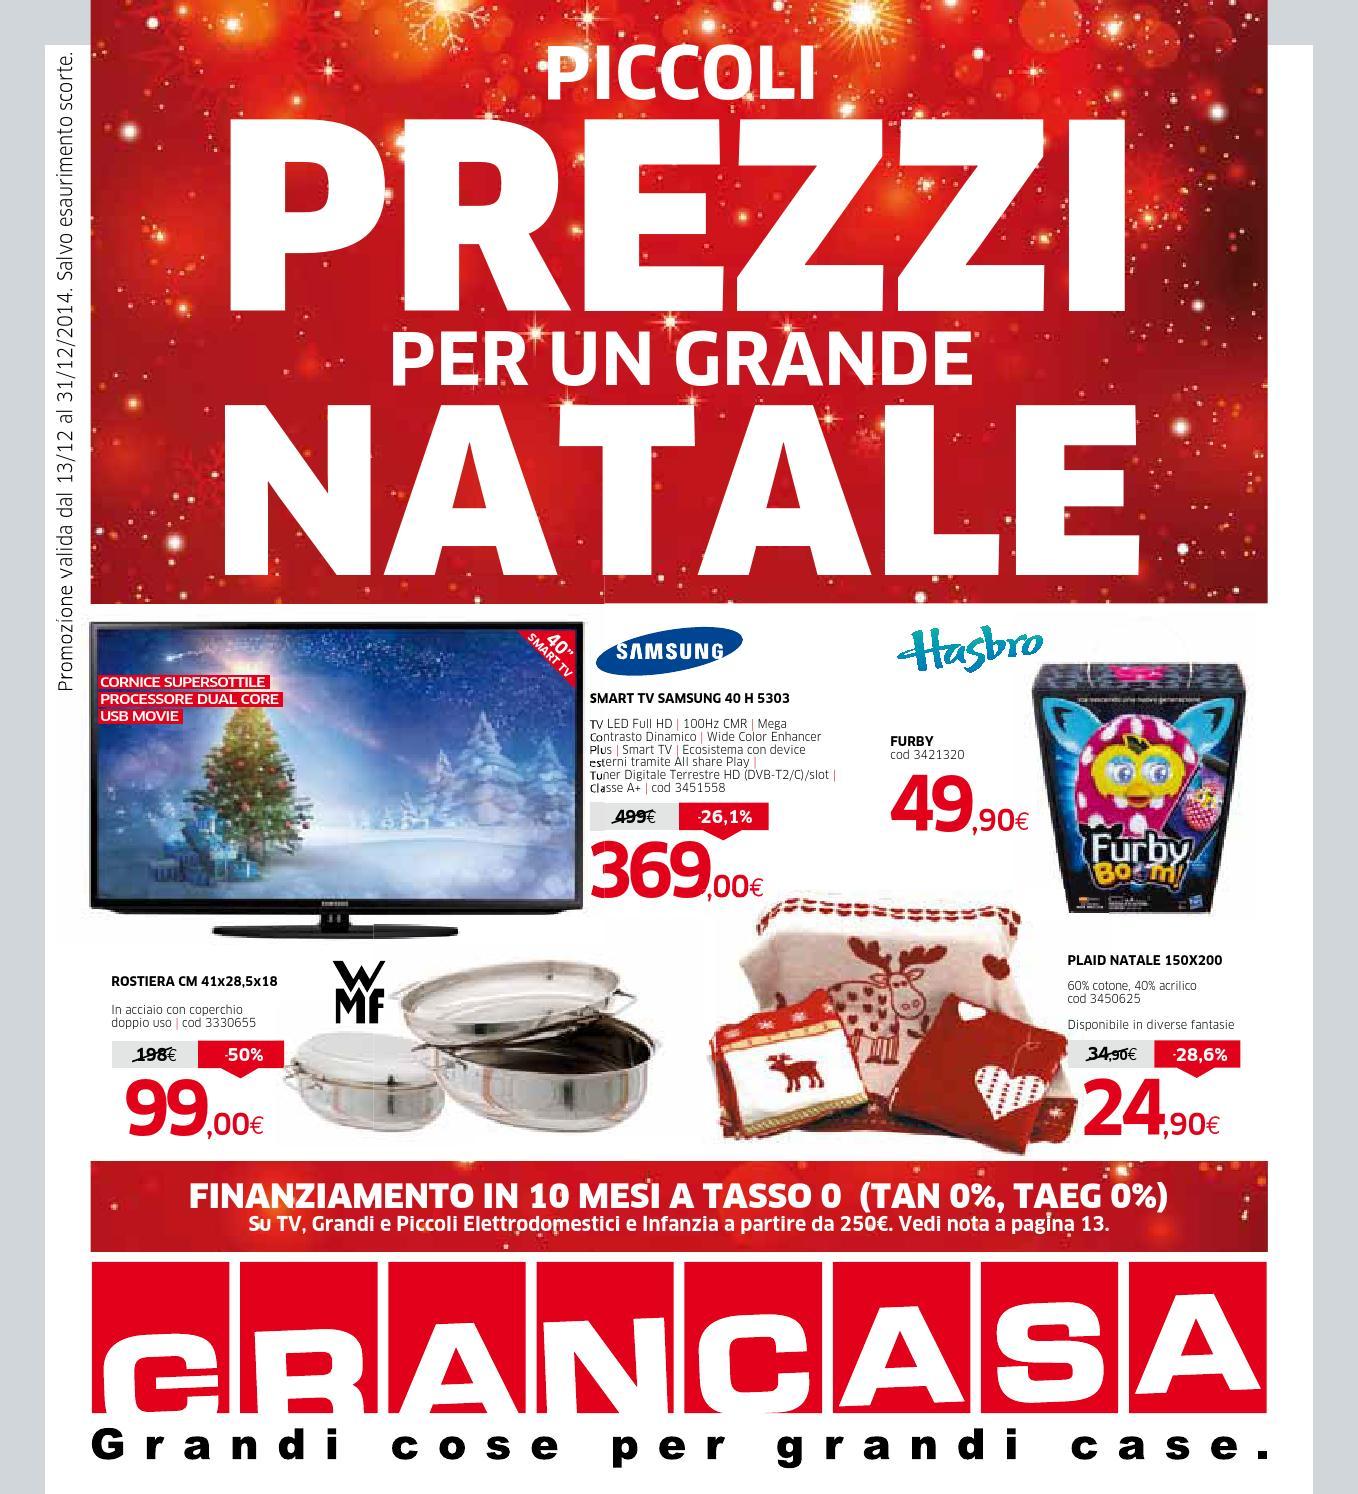 Grancasa offerte lavatrici cool open uri yep with grancasa offerte lavatrici beautiful - Grancasa paderno ...